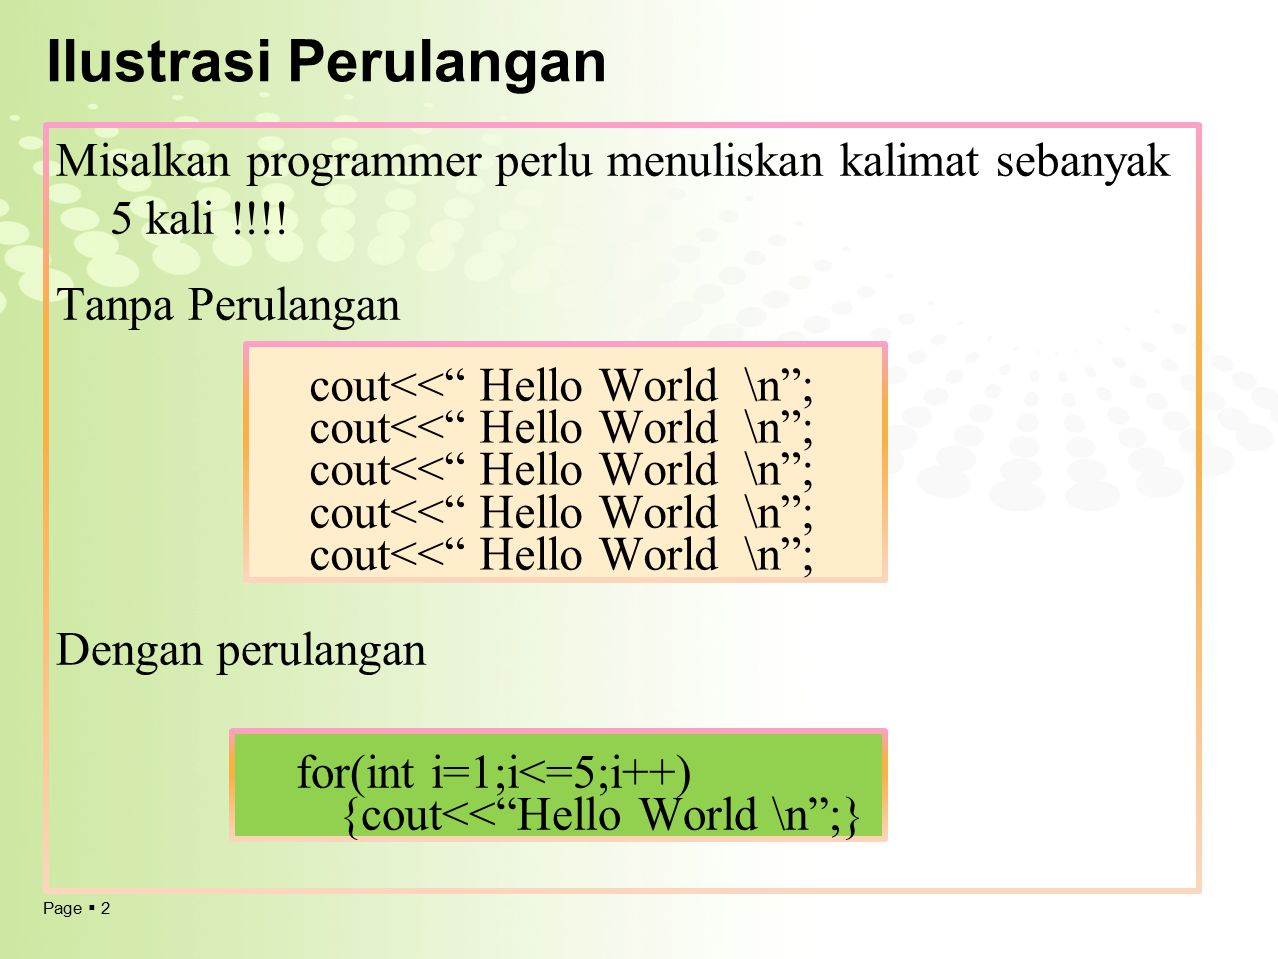 Ilustrasi Perulangan Misalkan programmer perlu menuliskan kalimat sebanyak 5 kali !!!! Tanpa Perulangan.